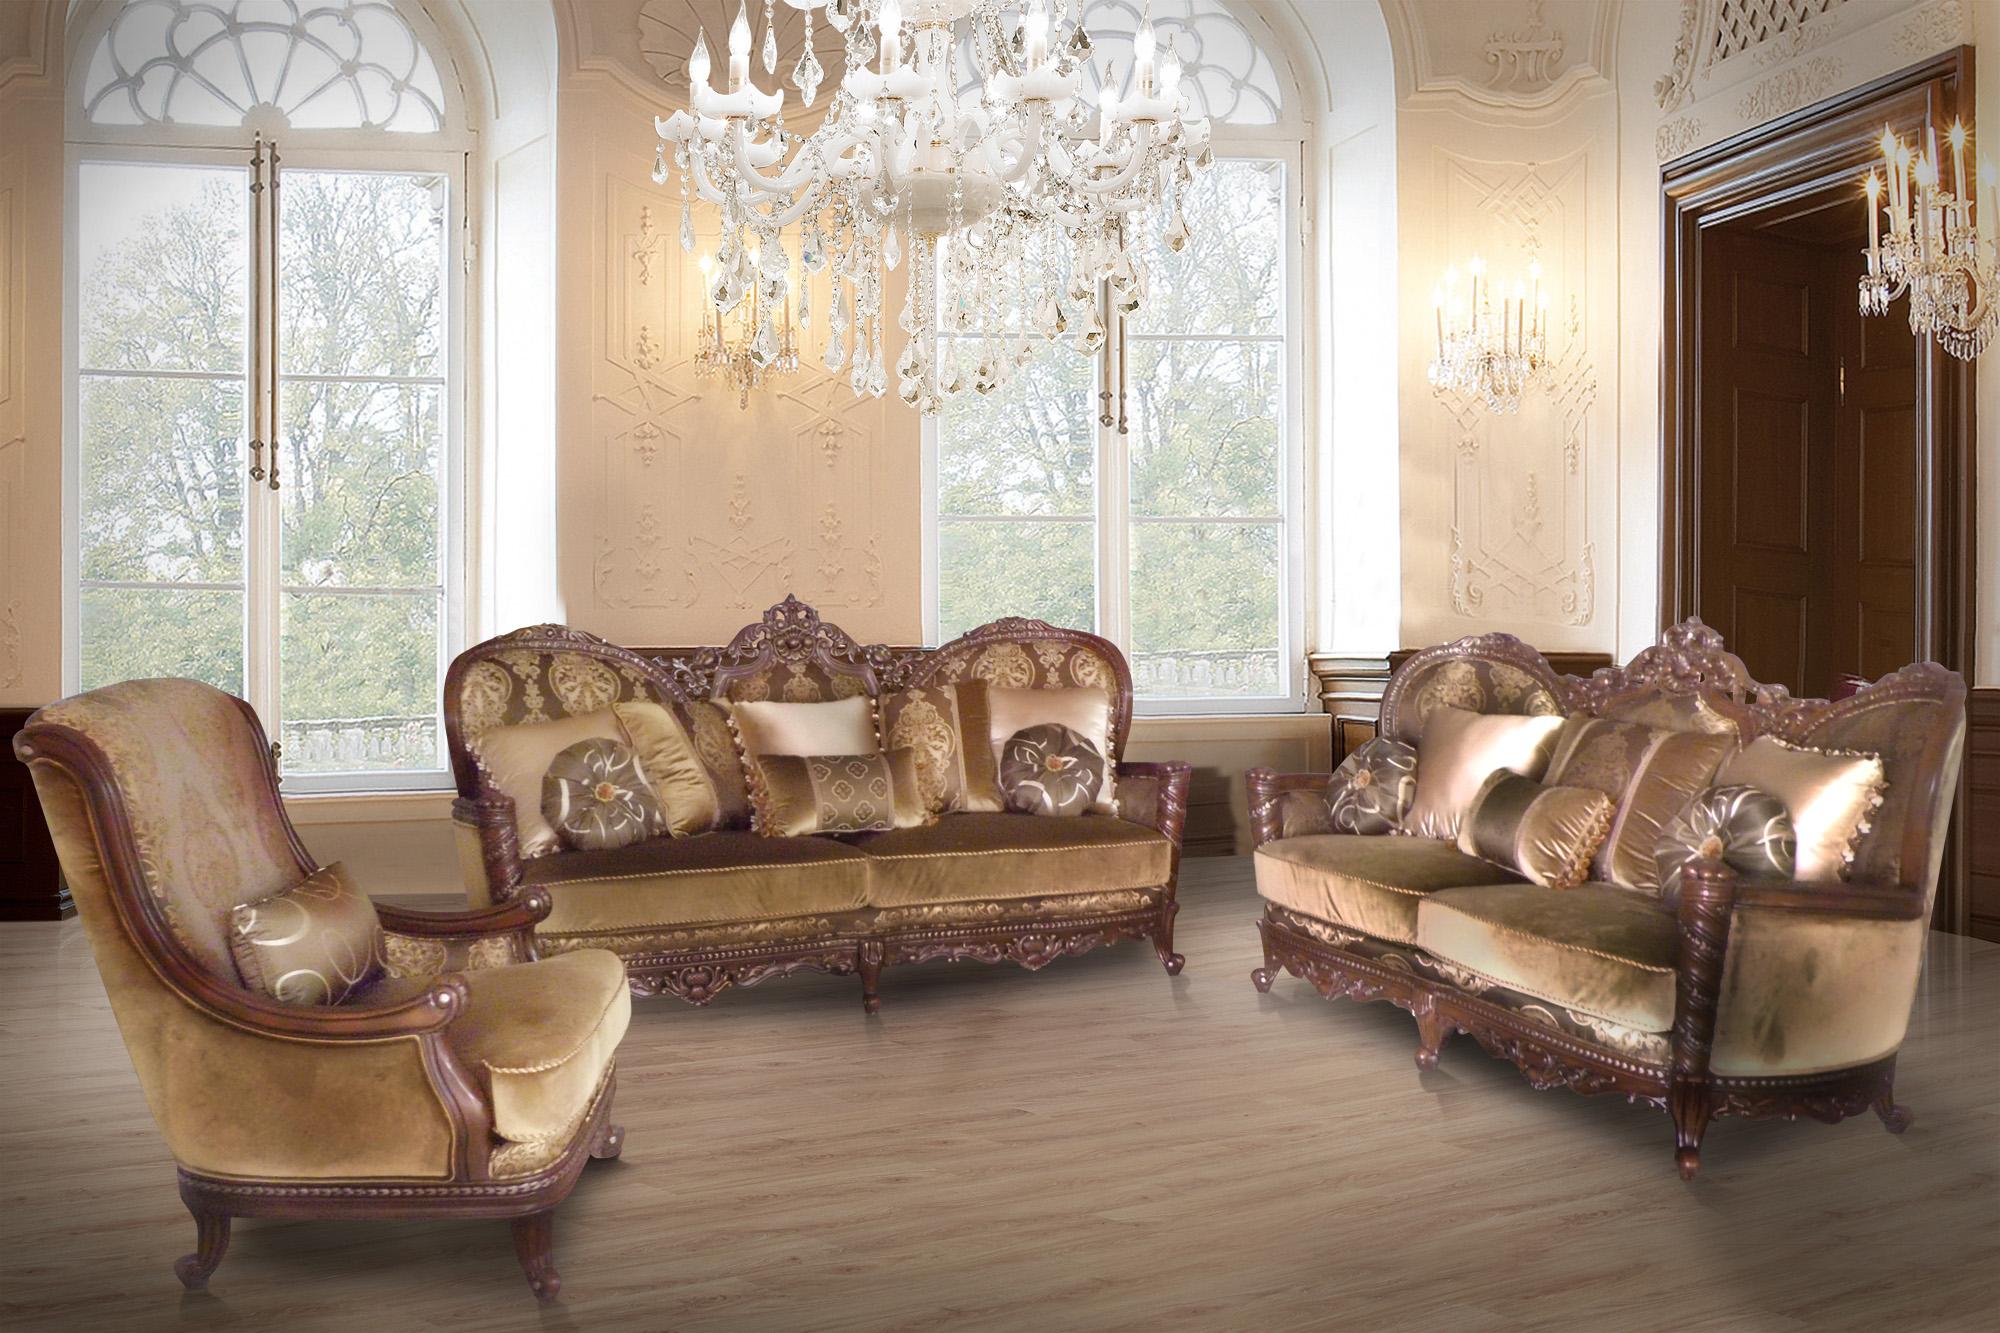 Armani Dark Sundeep Furniture Ltd